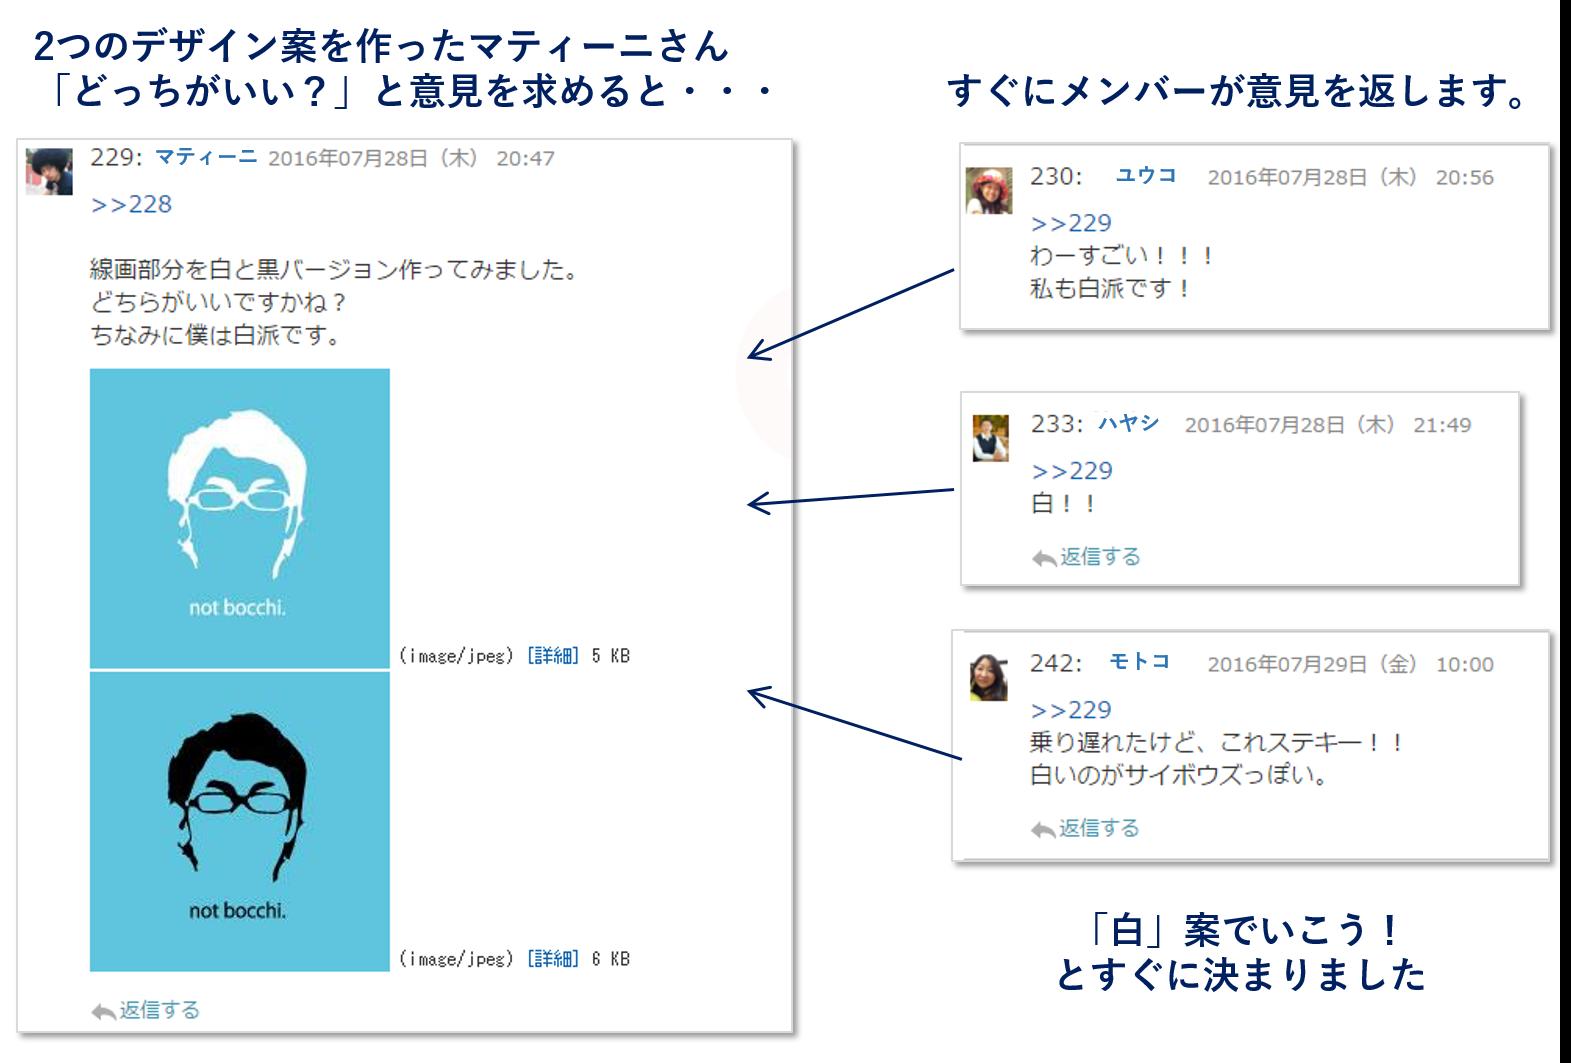 https://enterprise.cybozu.co.jp/6558544478d1193d58b4d3ae069720e06cf375c6.png